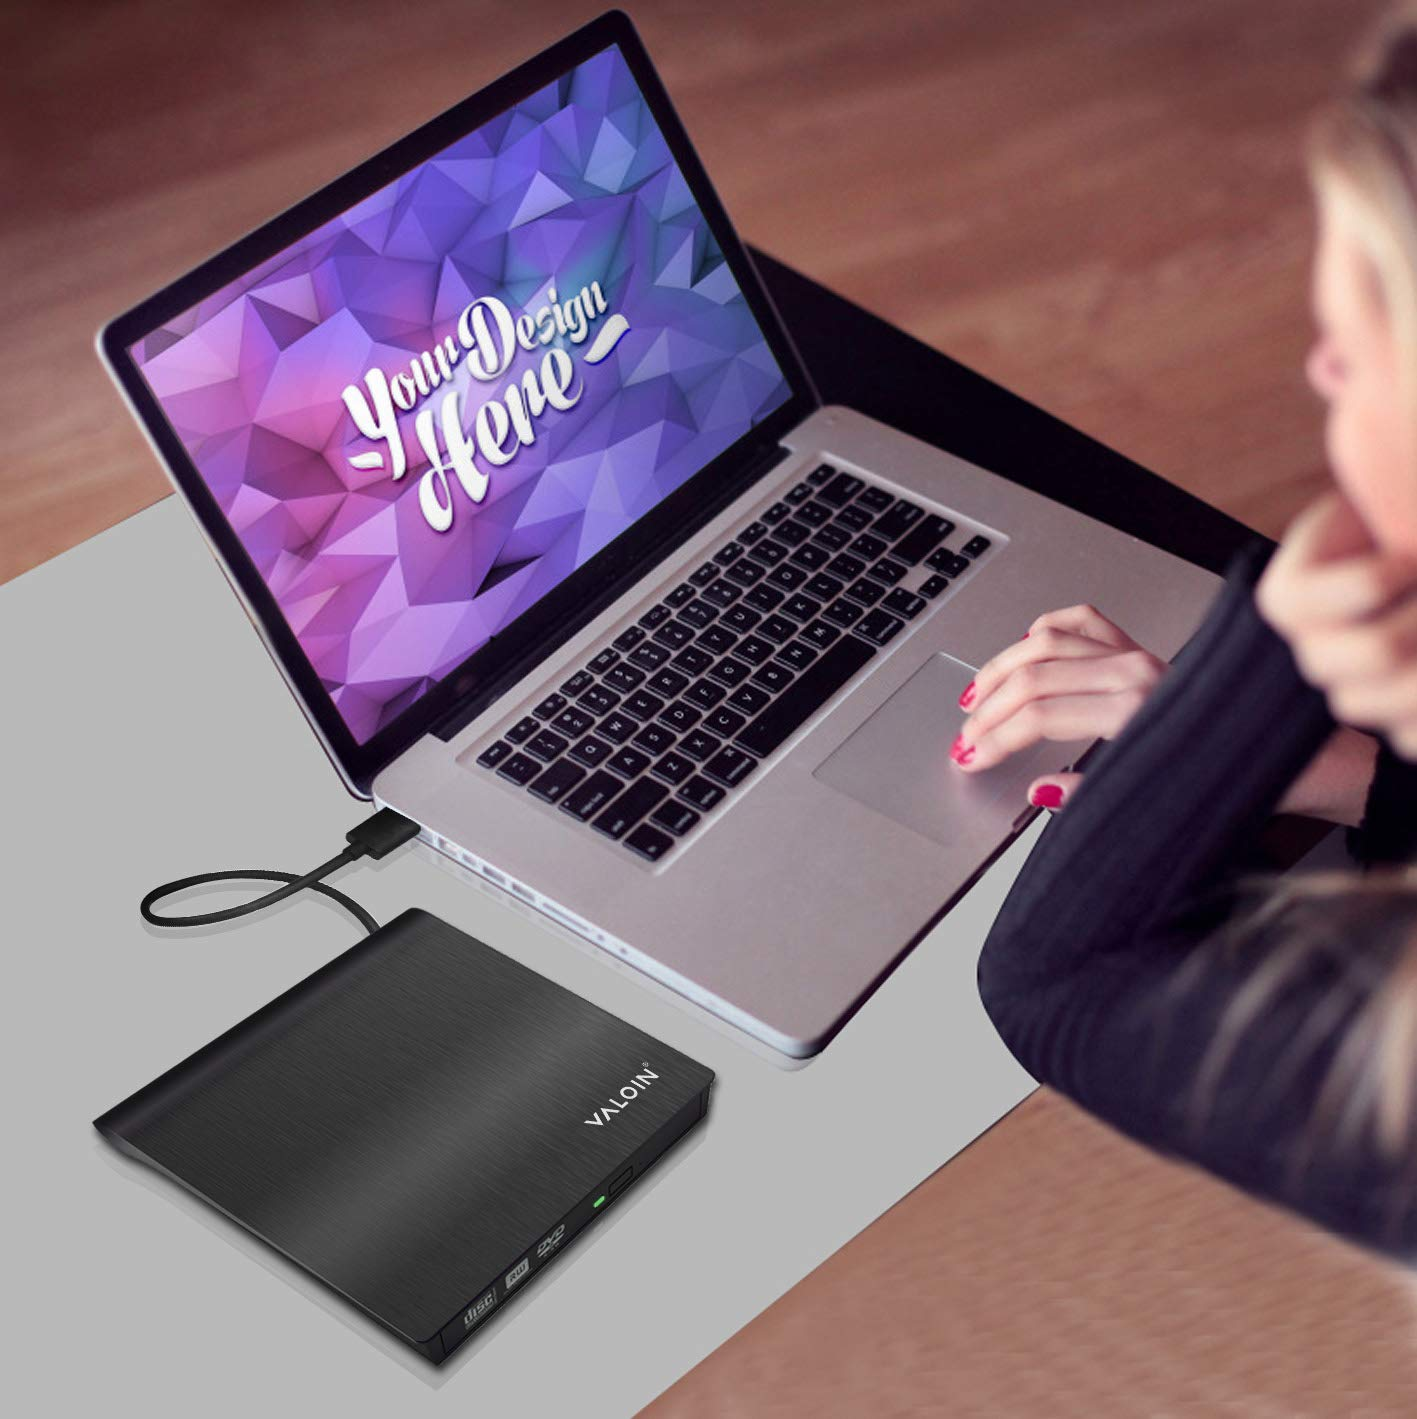 [2019 New Version]External DVD Drive,USB 3.0 Portable Ultra-Slim CD-RW ROM Drive Player Burner Writer Rewriter,Plug and Play by Valoin (Image #8)